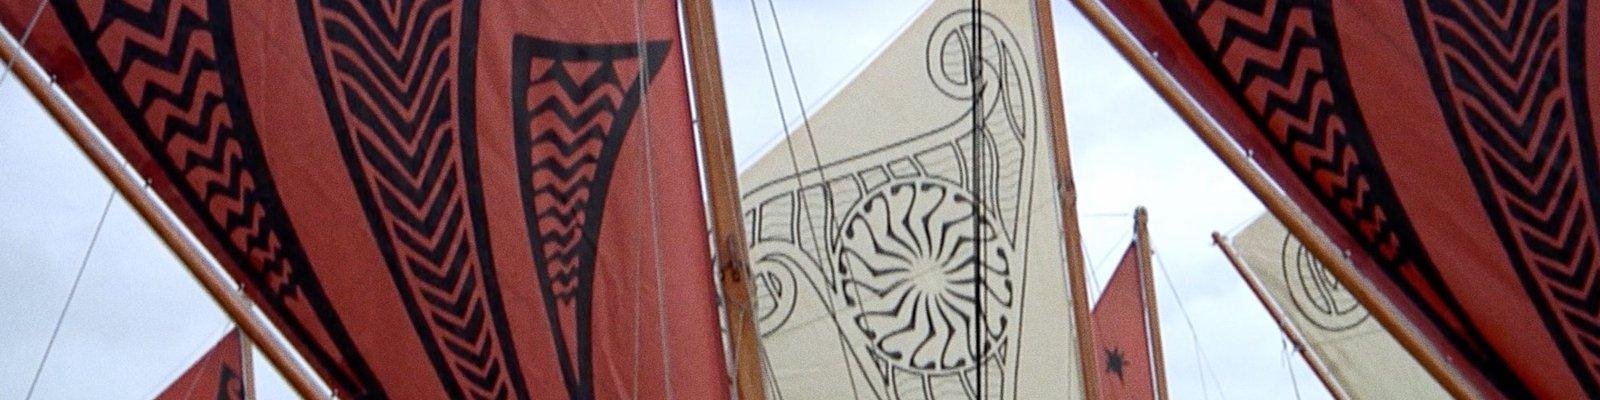 Waka sailing image